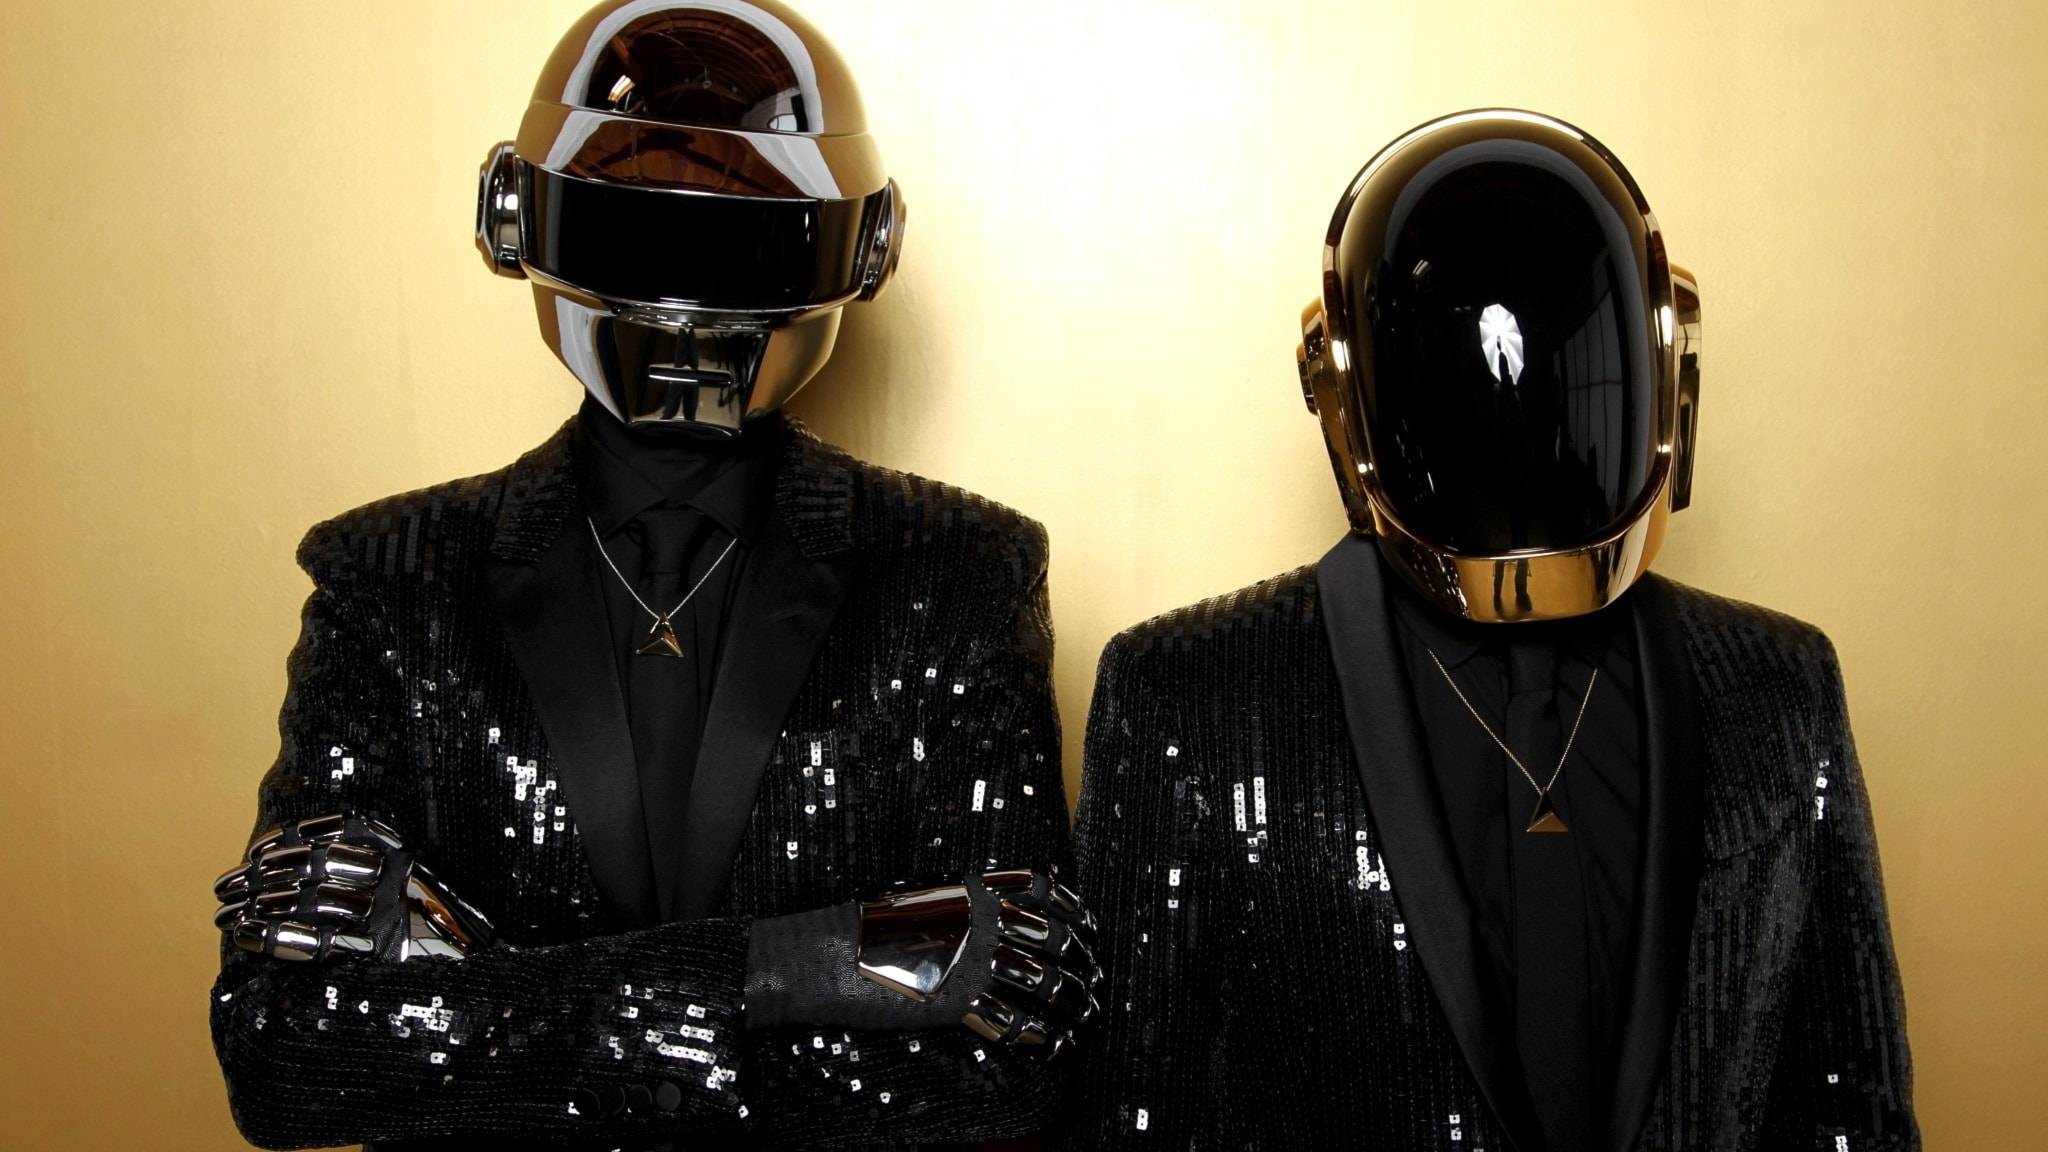 Musikduon Daft Punk